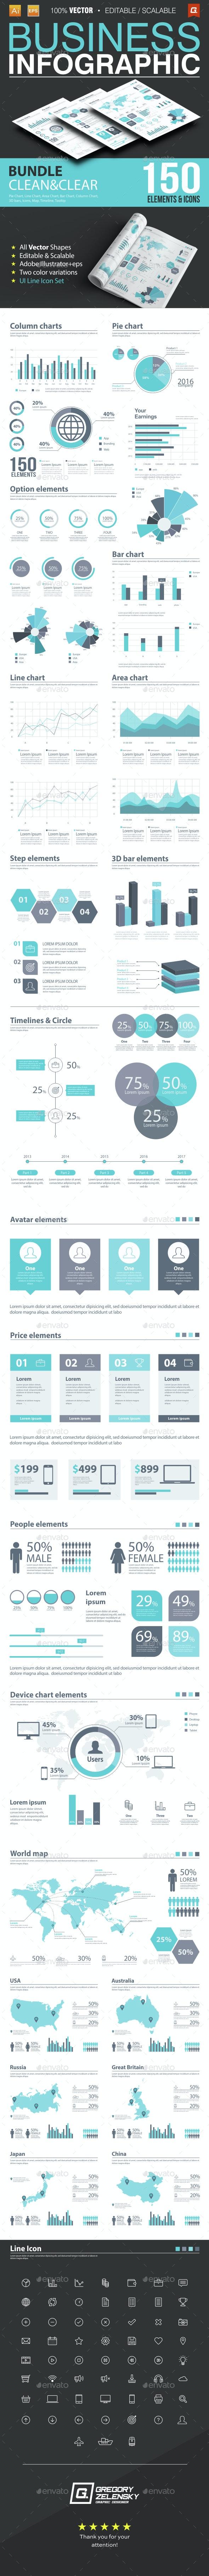 Business Infographic Bundle 150 Elements - Infographics